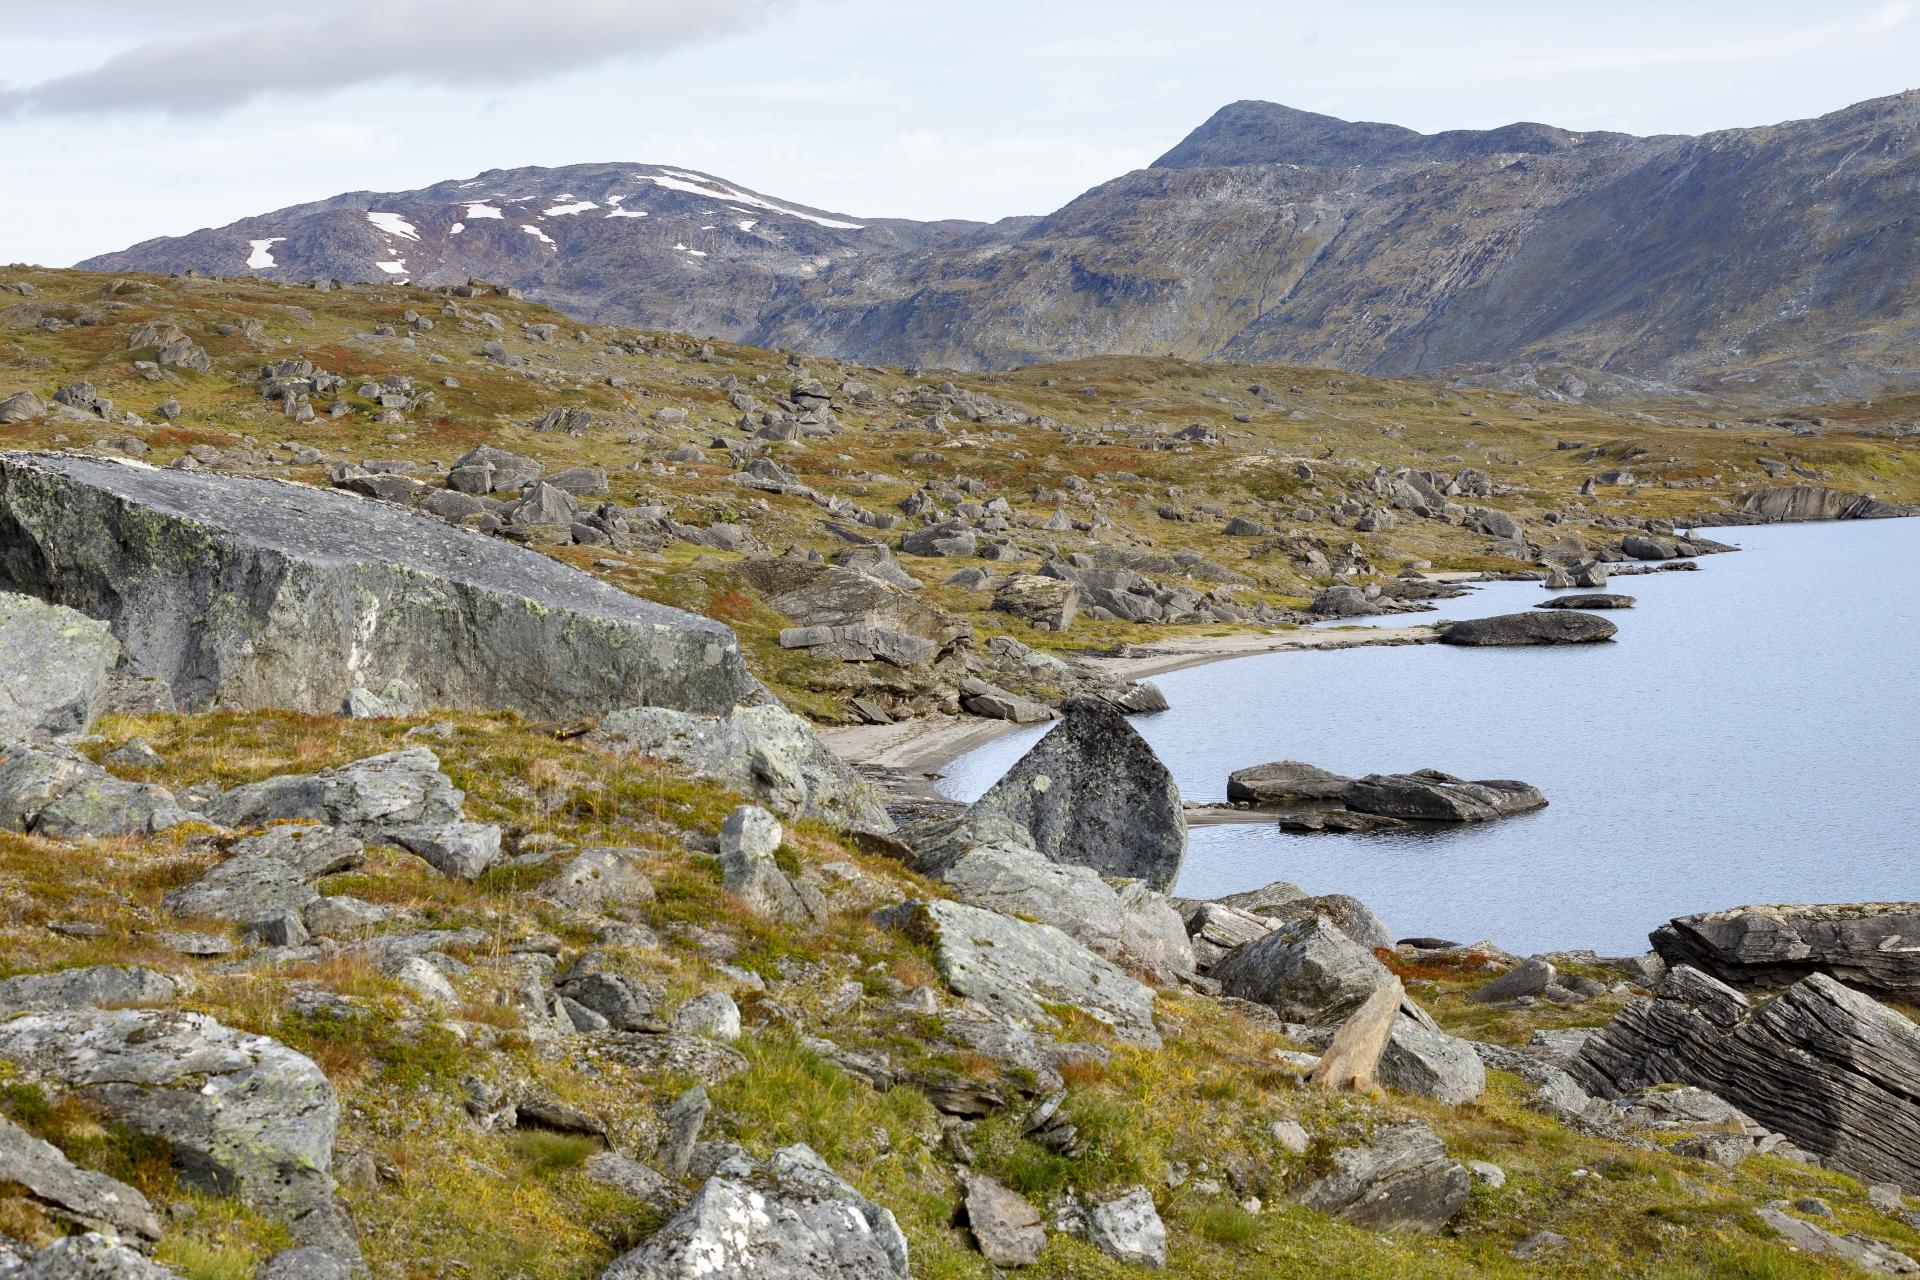 Westufer des Kåbtåjaure und  Paurofjellet